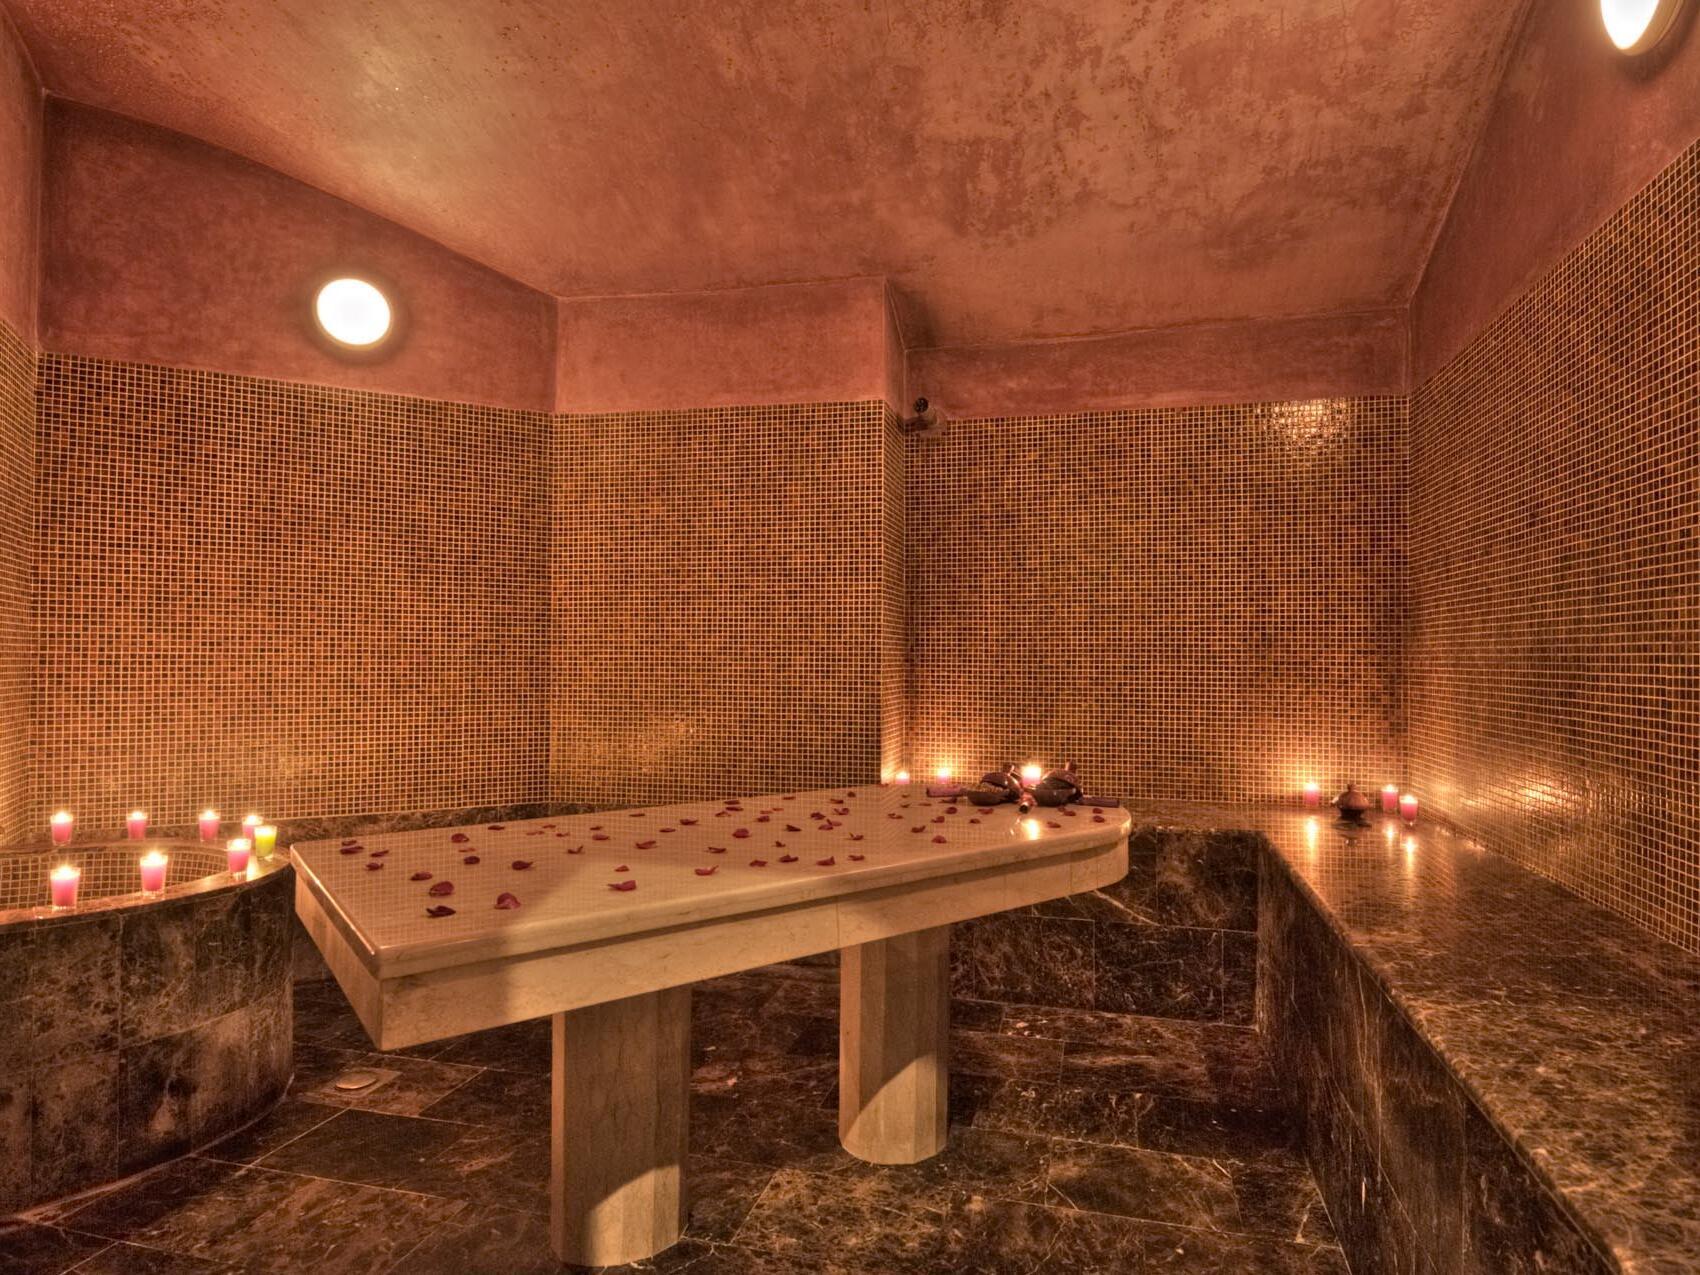 Candle-lit Spa - Farah Tanger Hotel